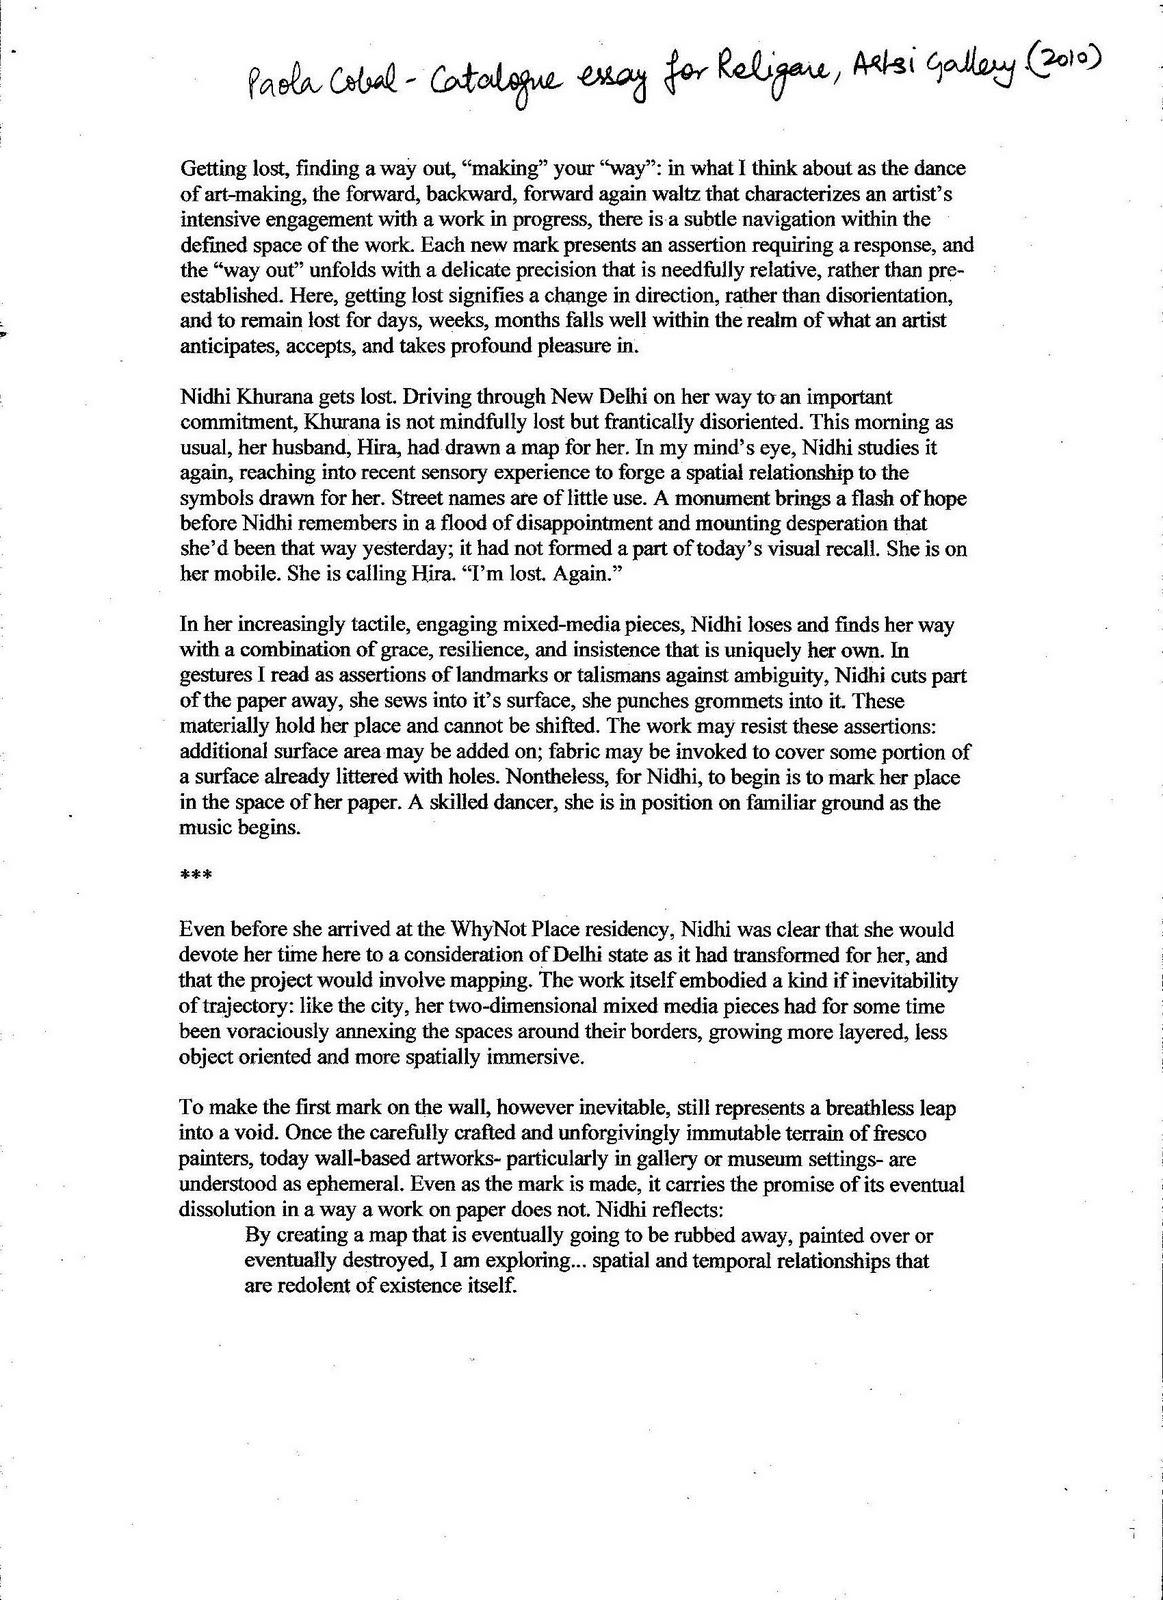 002 Hero Essay Examples Example Staggering My Michigan Superhero Full